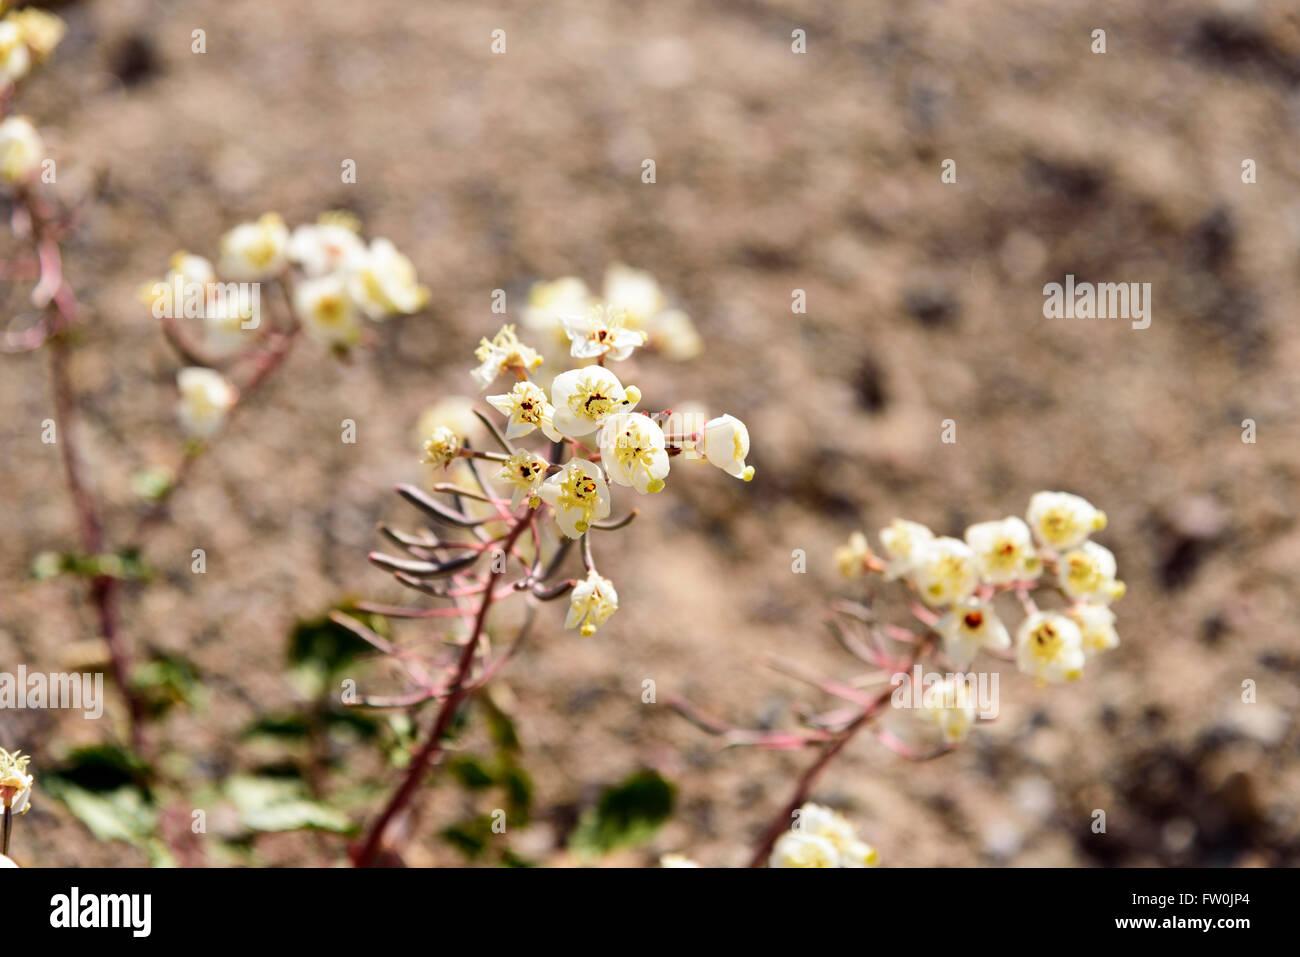 White Desert Flowers Close To Ground Stock Photo 101432972 Alamy